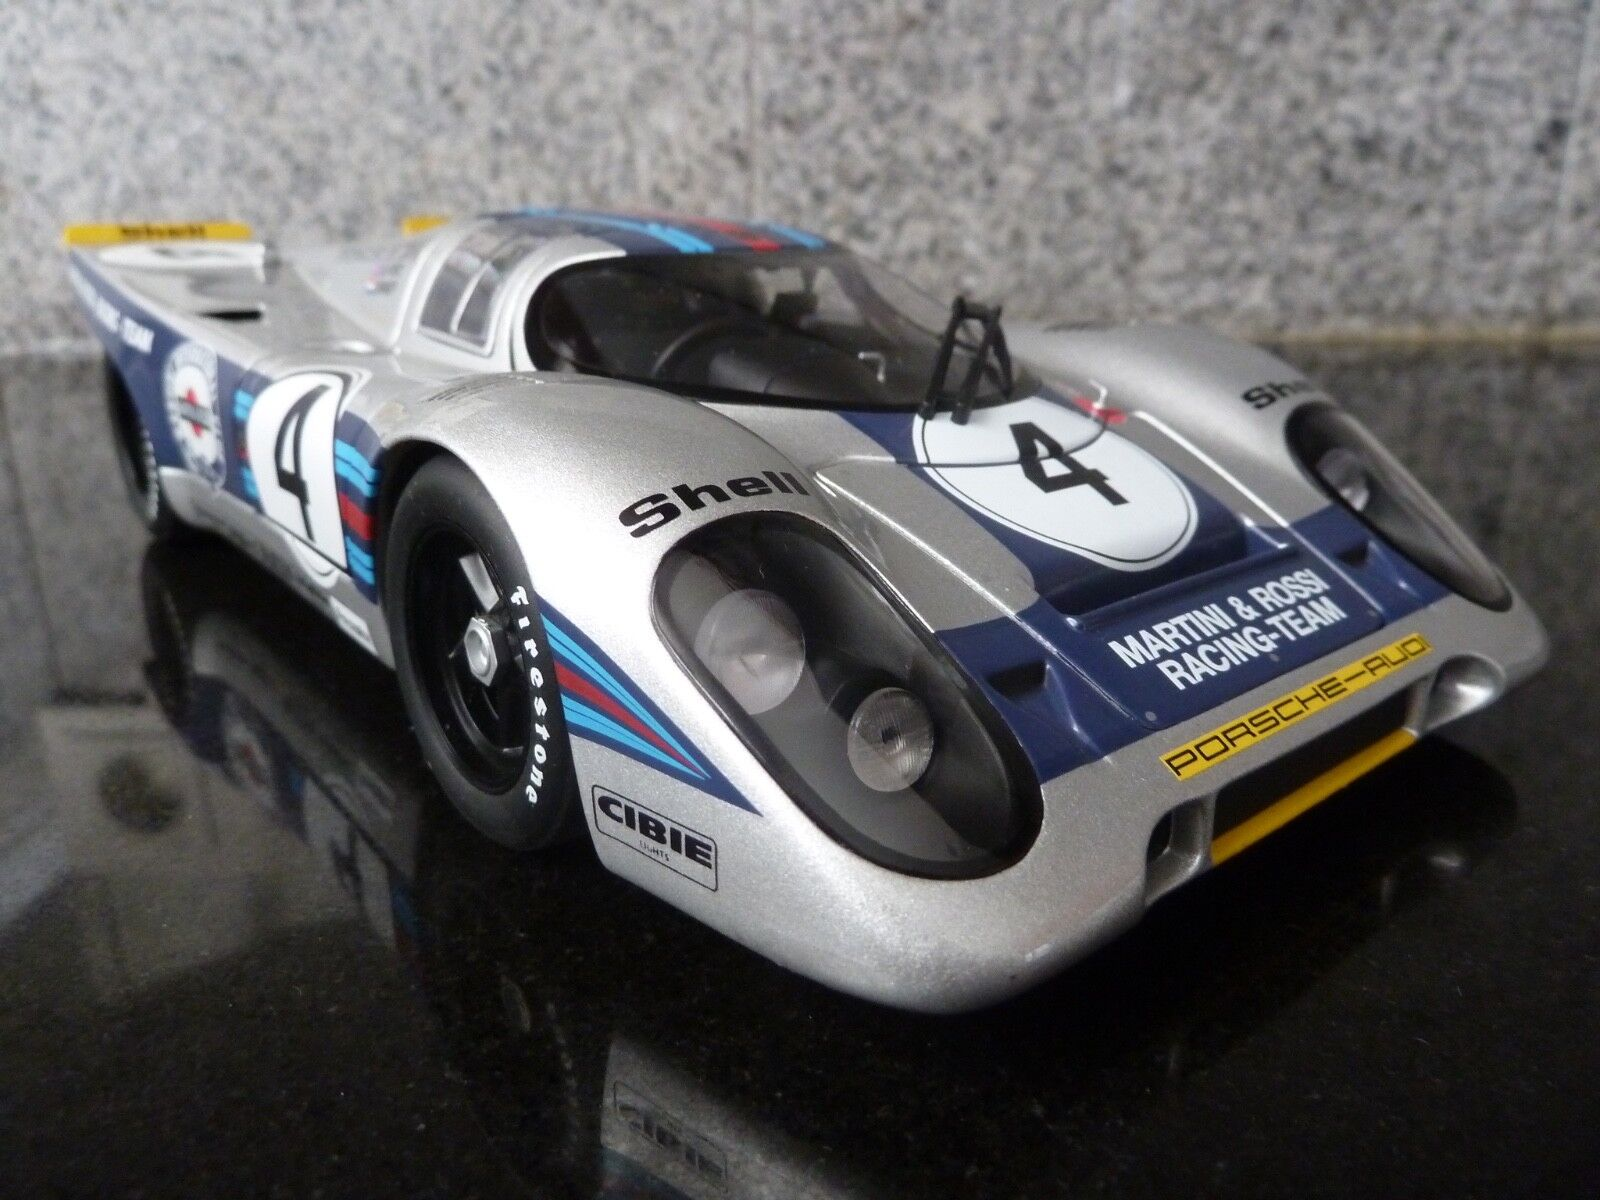 1 18 Autoart, Porsche 917k, Martini racing, 24 H DAYTONA 1971